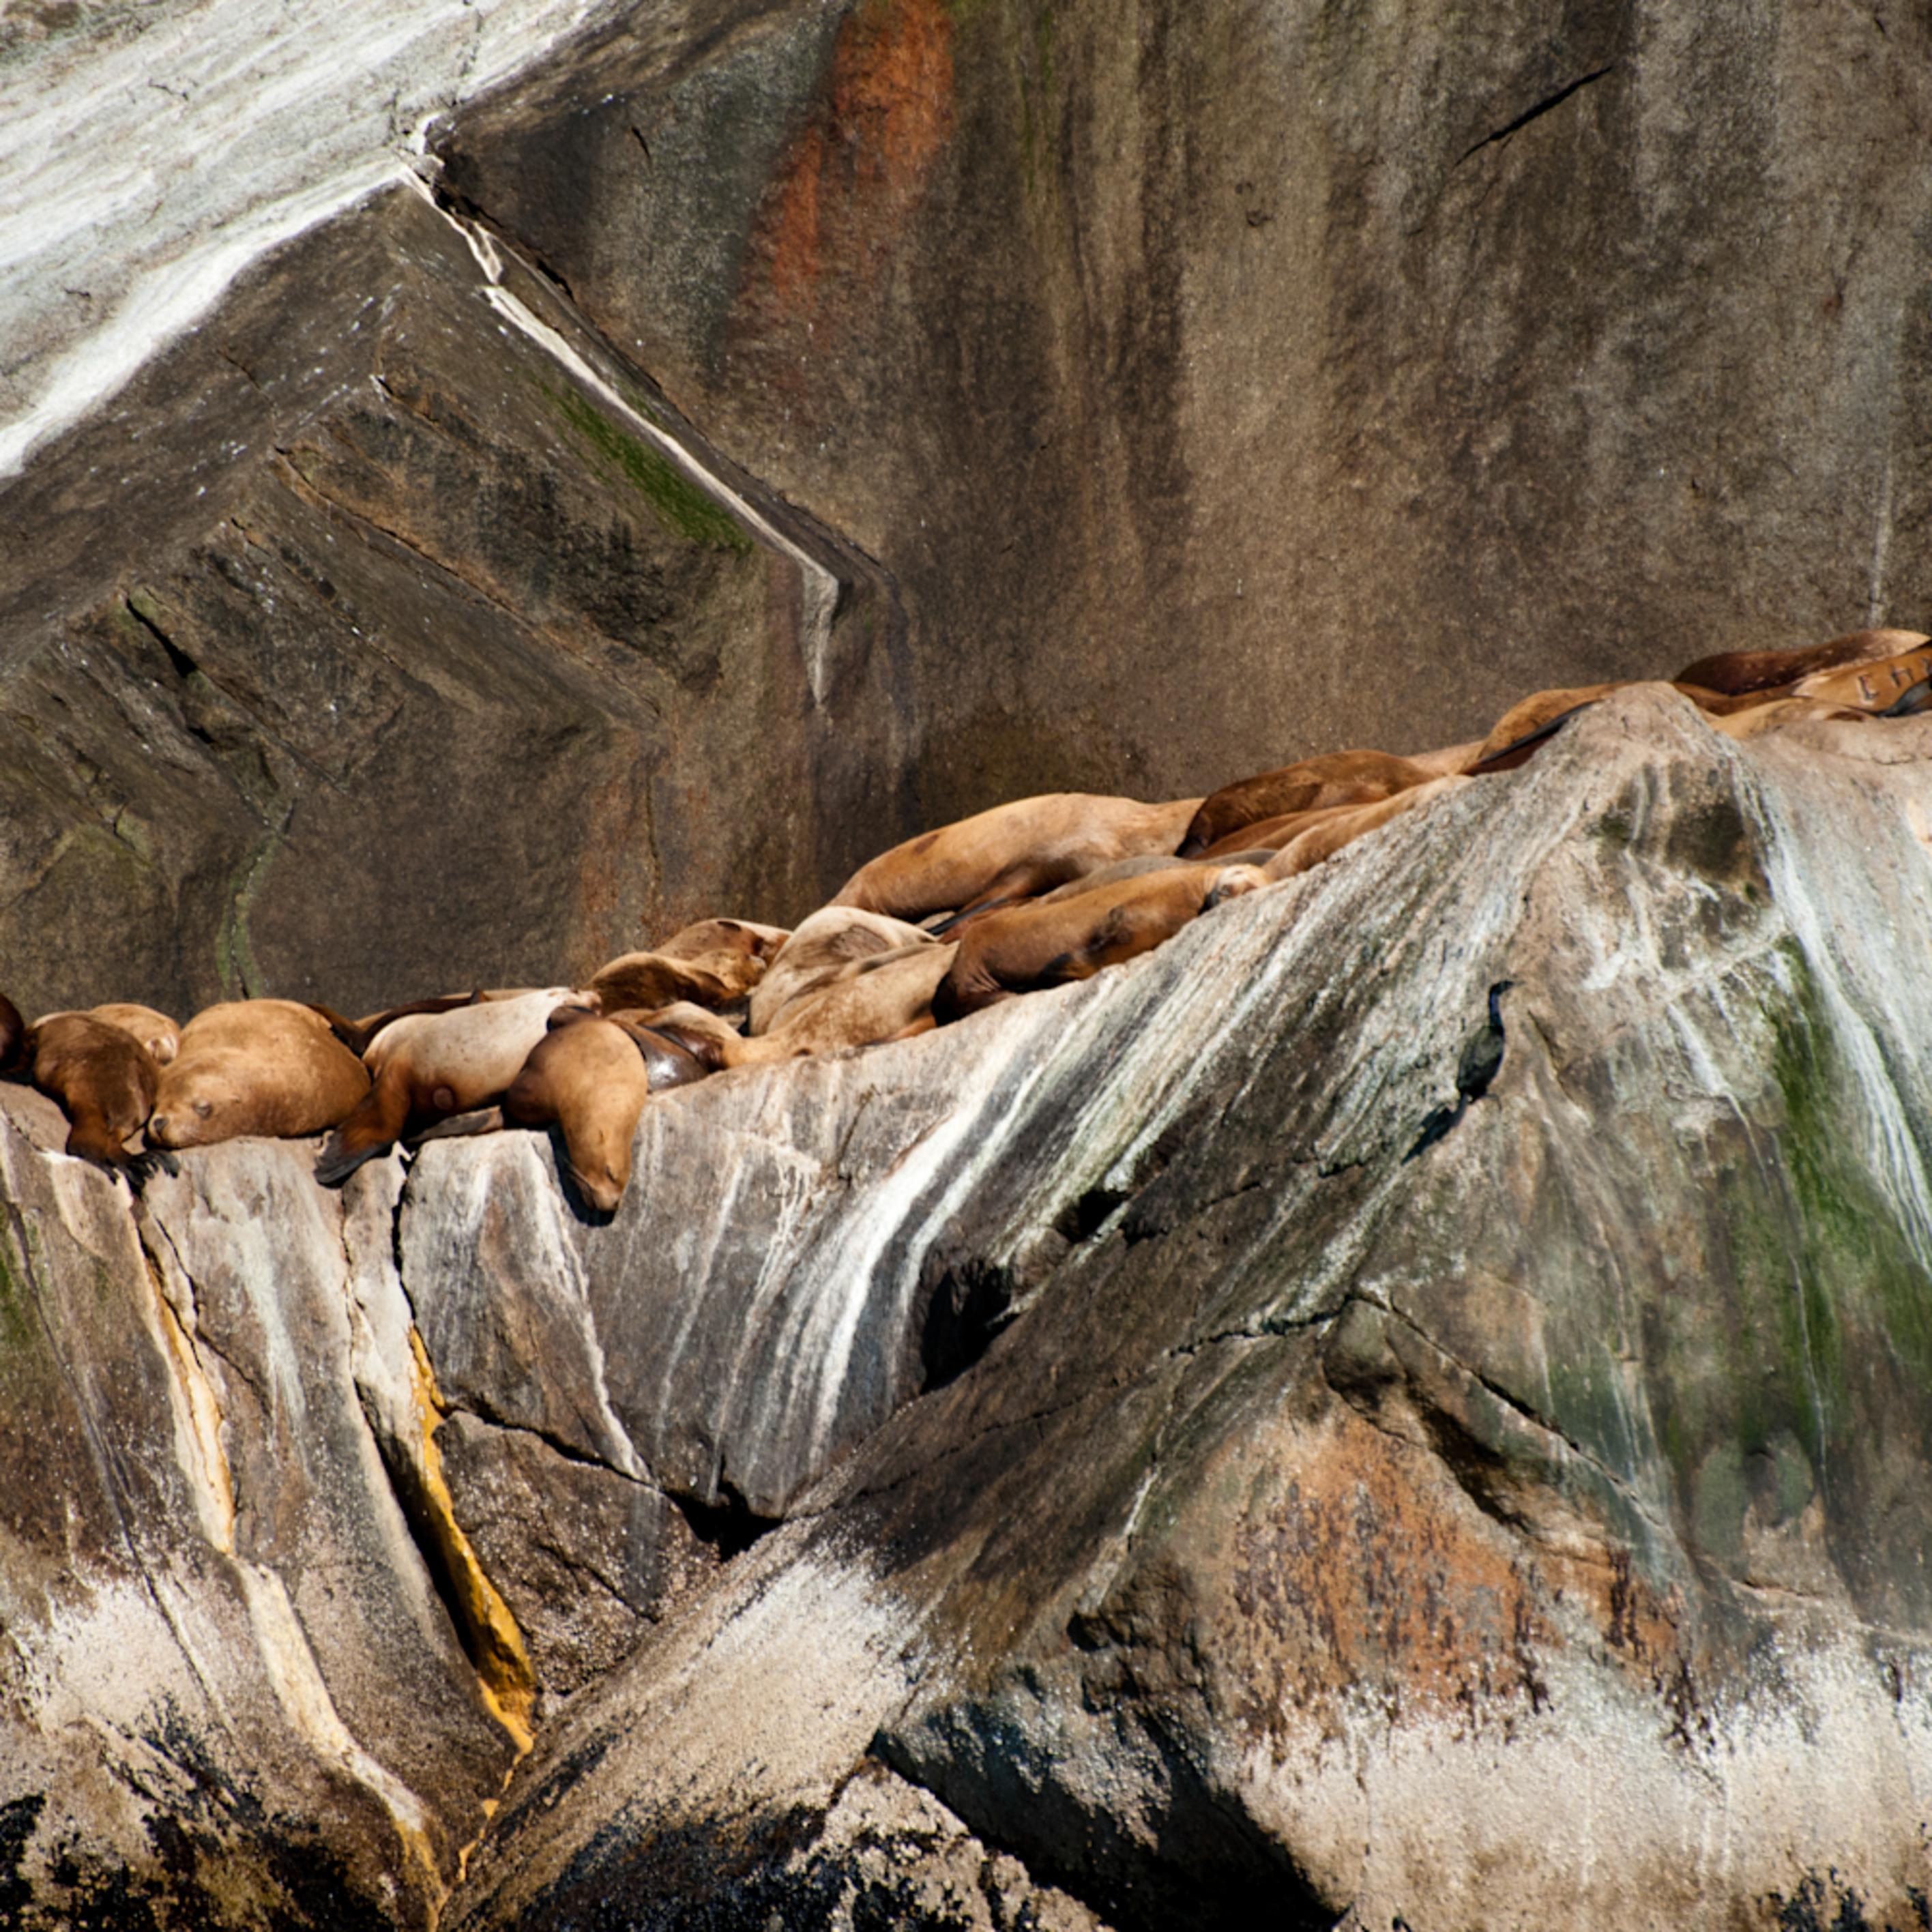 Basking steller sea lions onj7lh